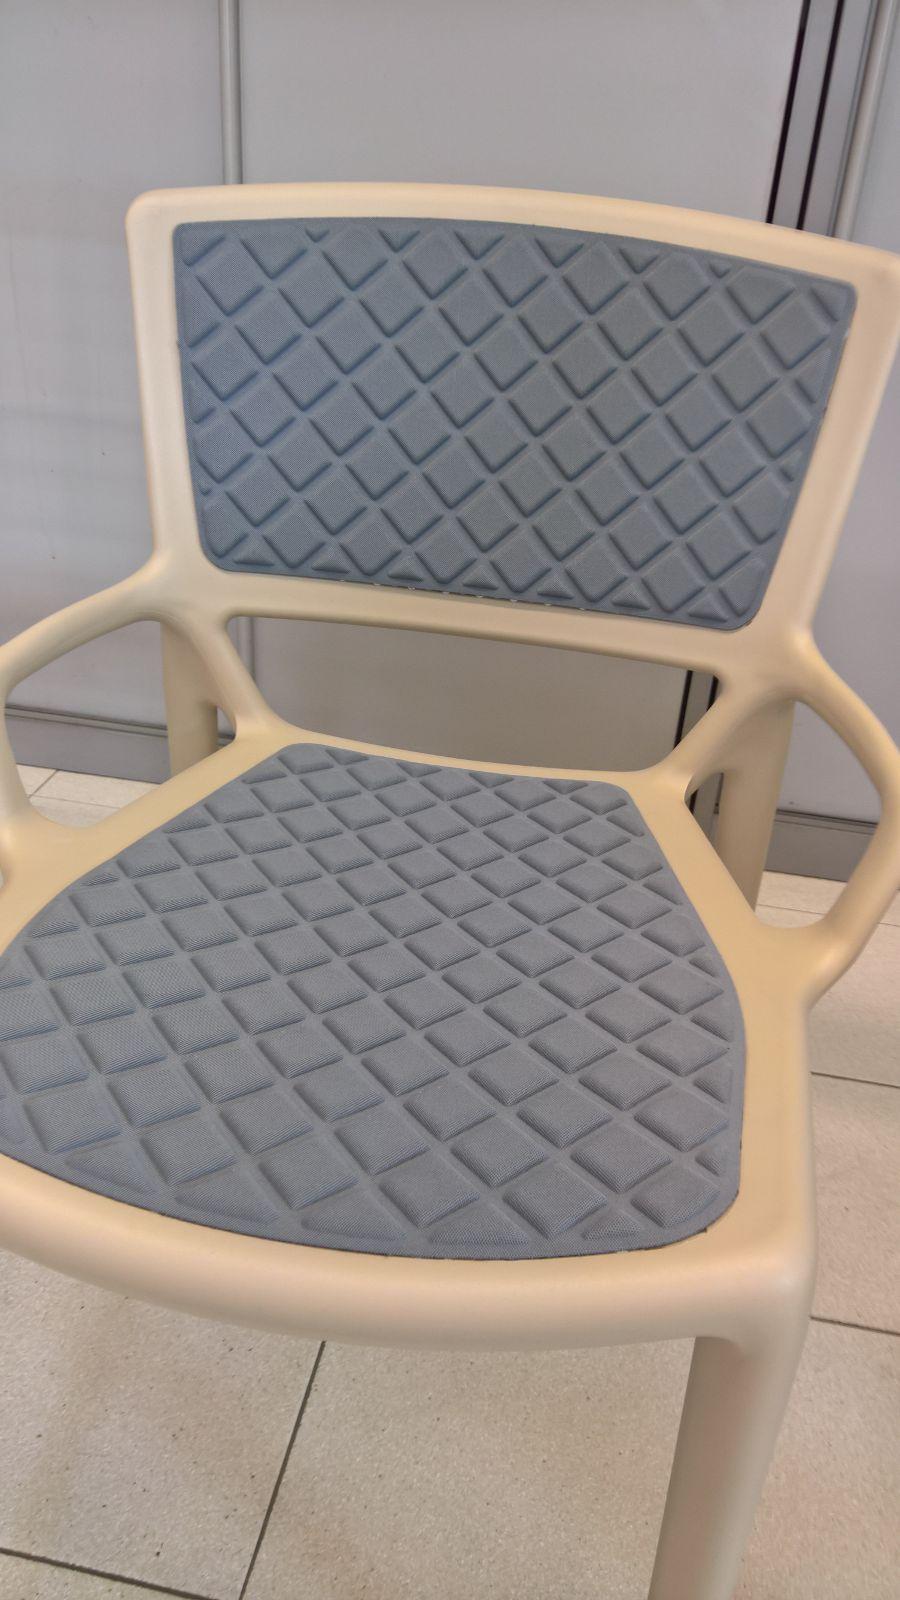 arredamento -cuscini per sedie Teamform